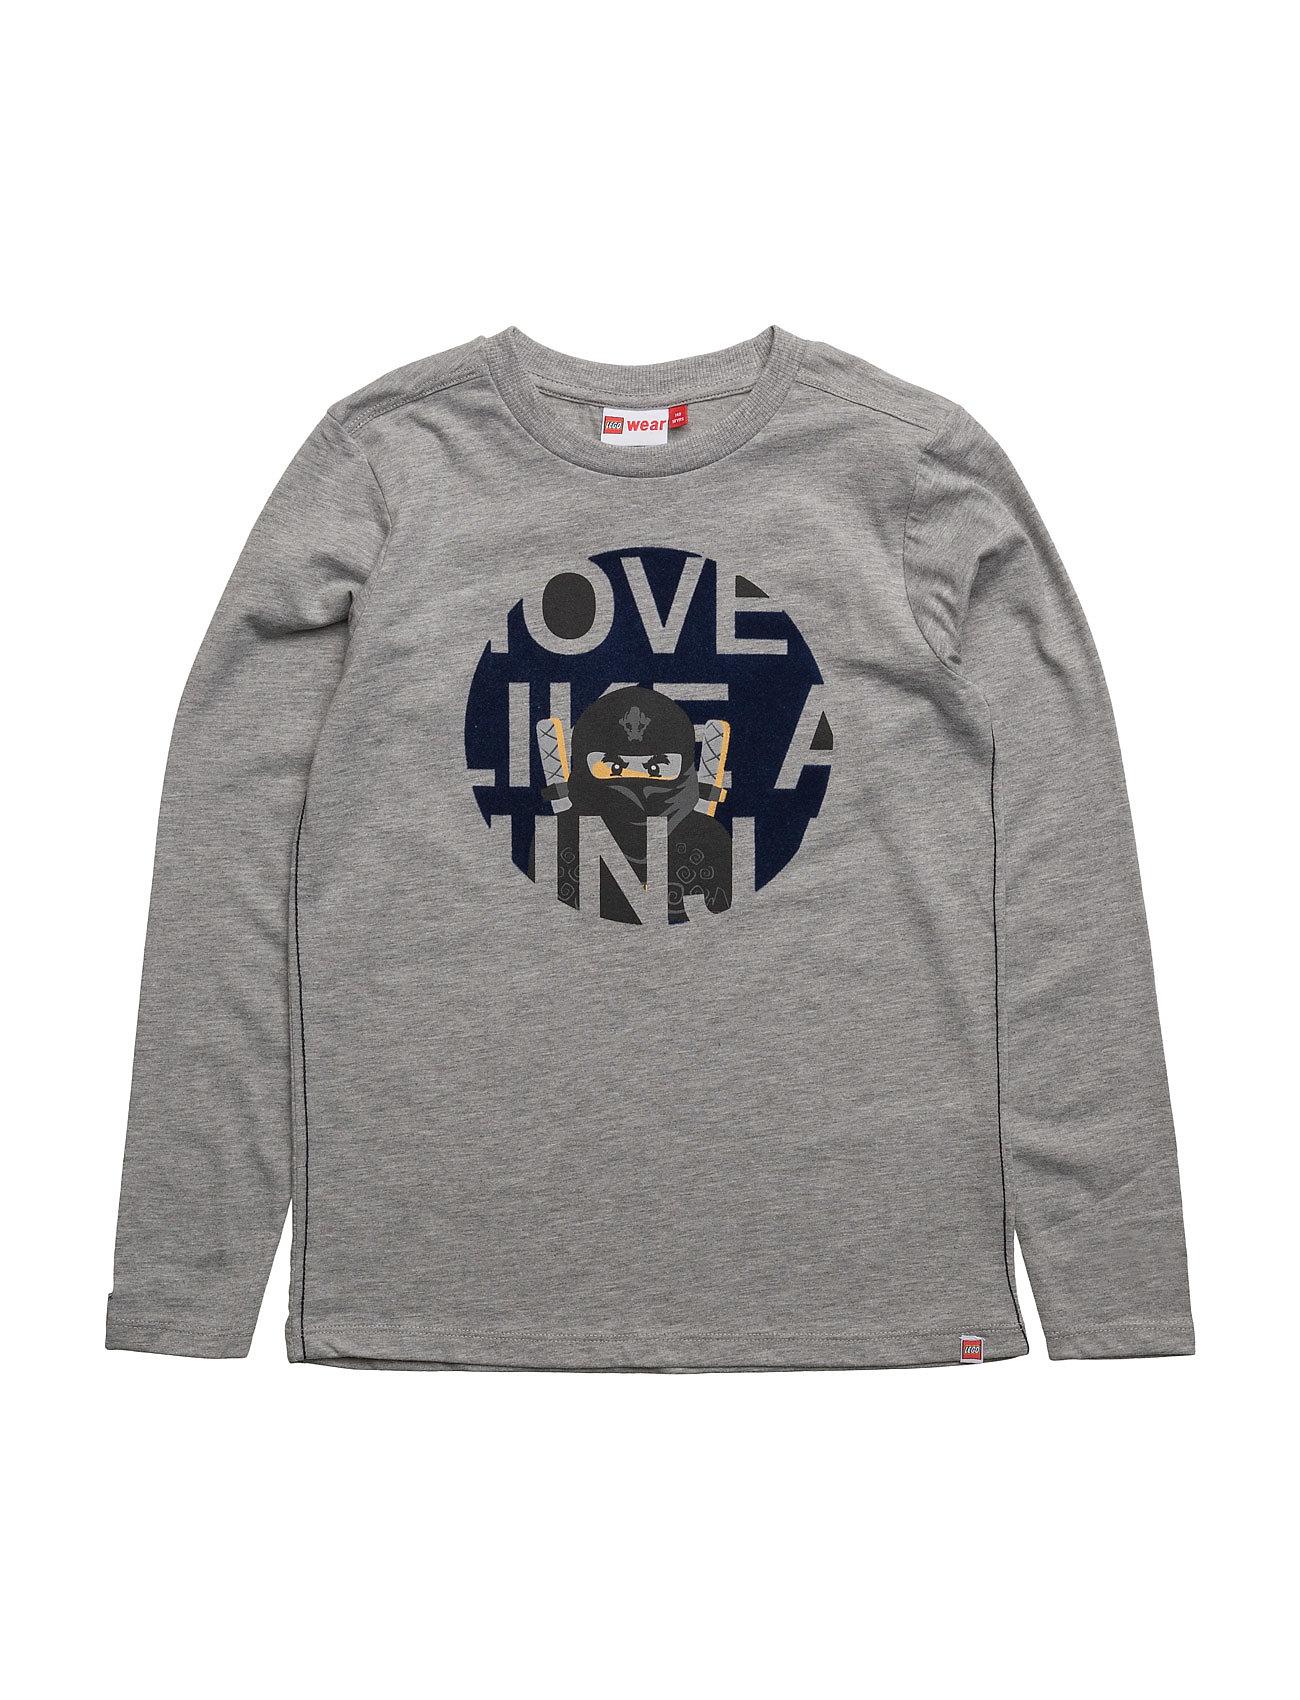 Teo 614 - T-Shirt L/S Lego wear T-shirts til Drenge i